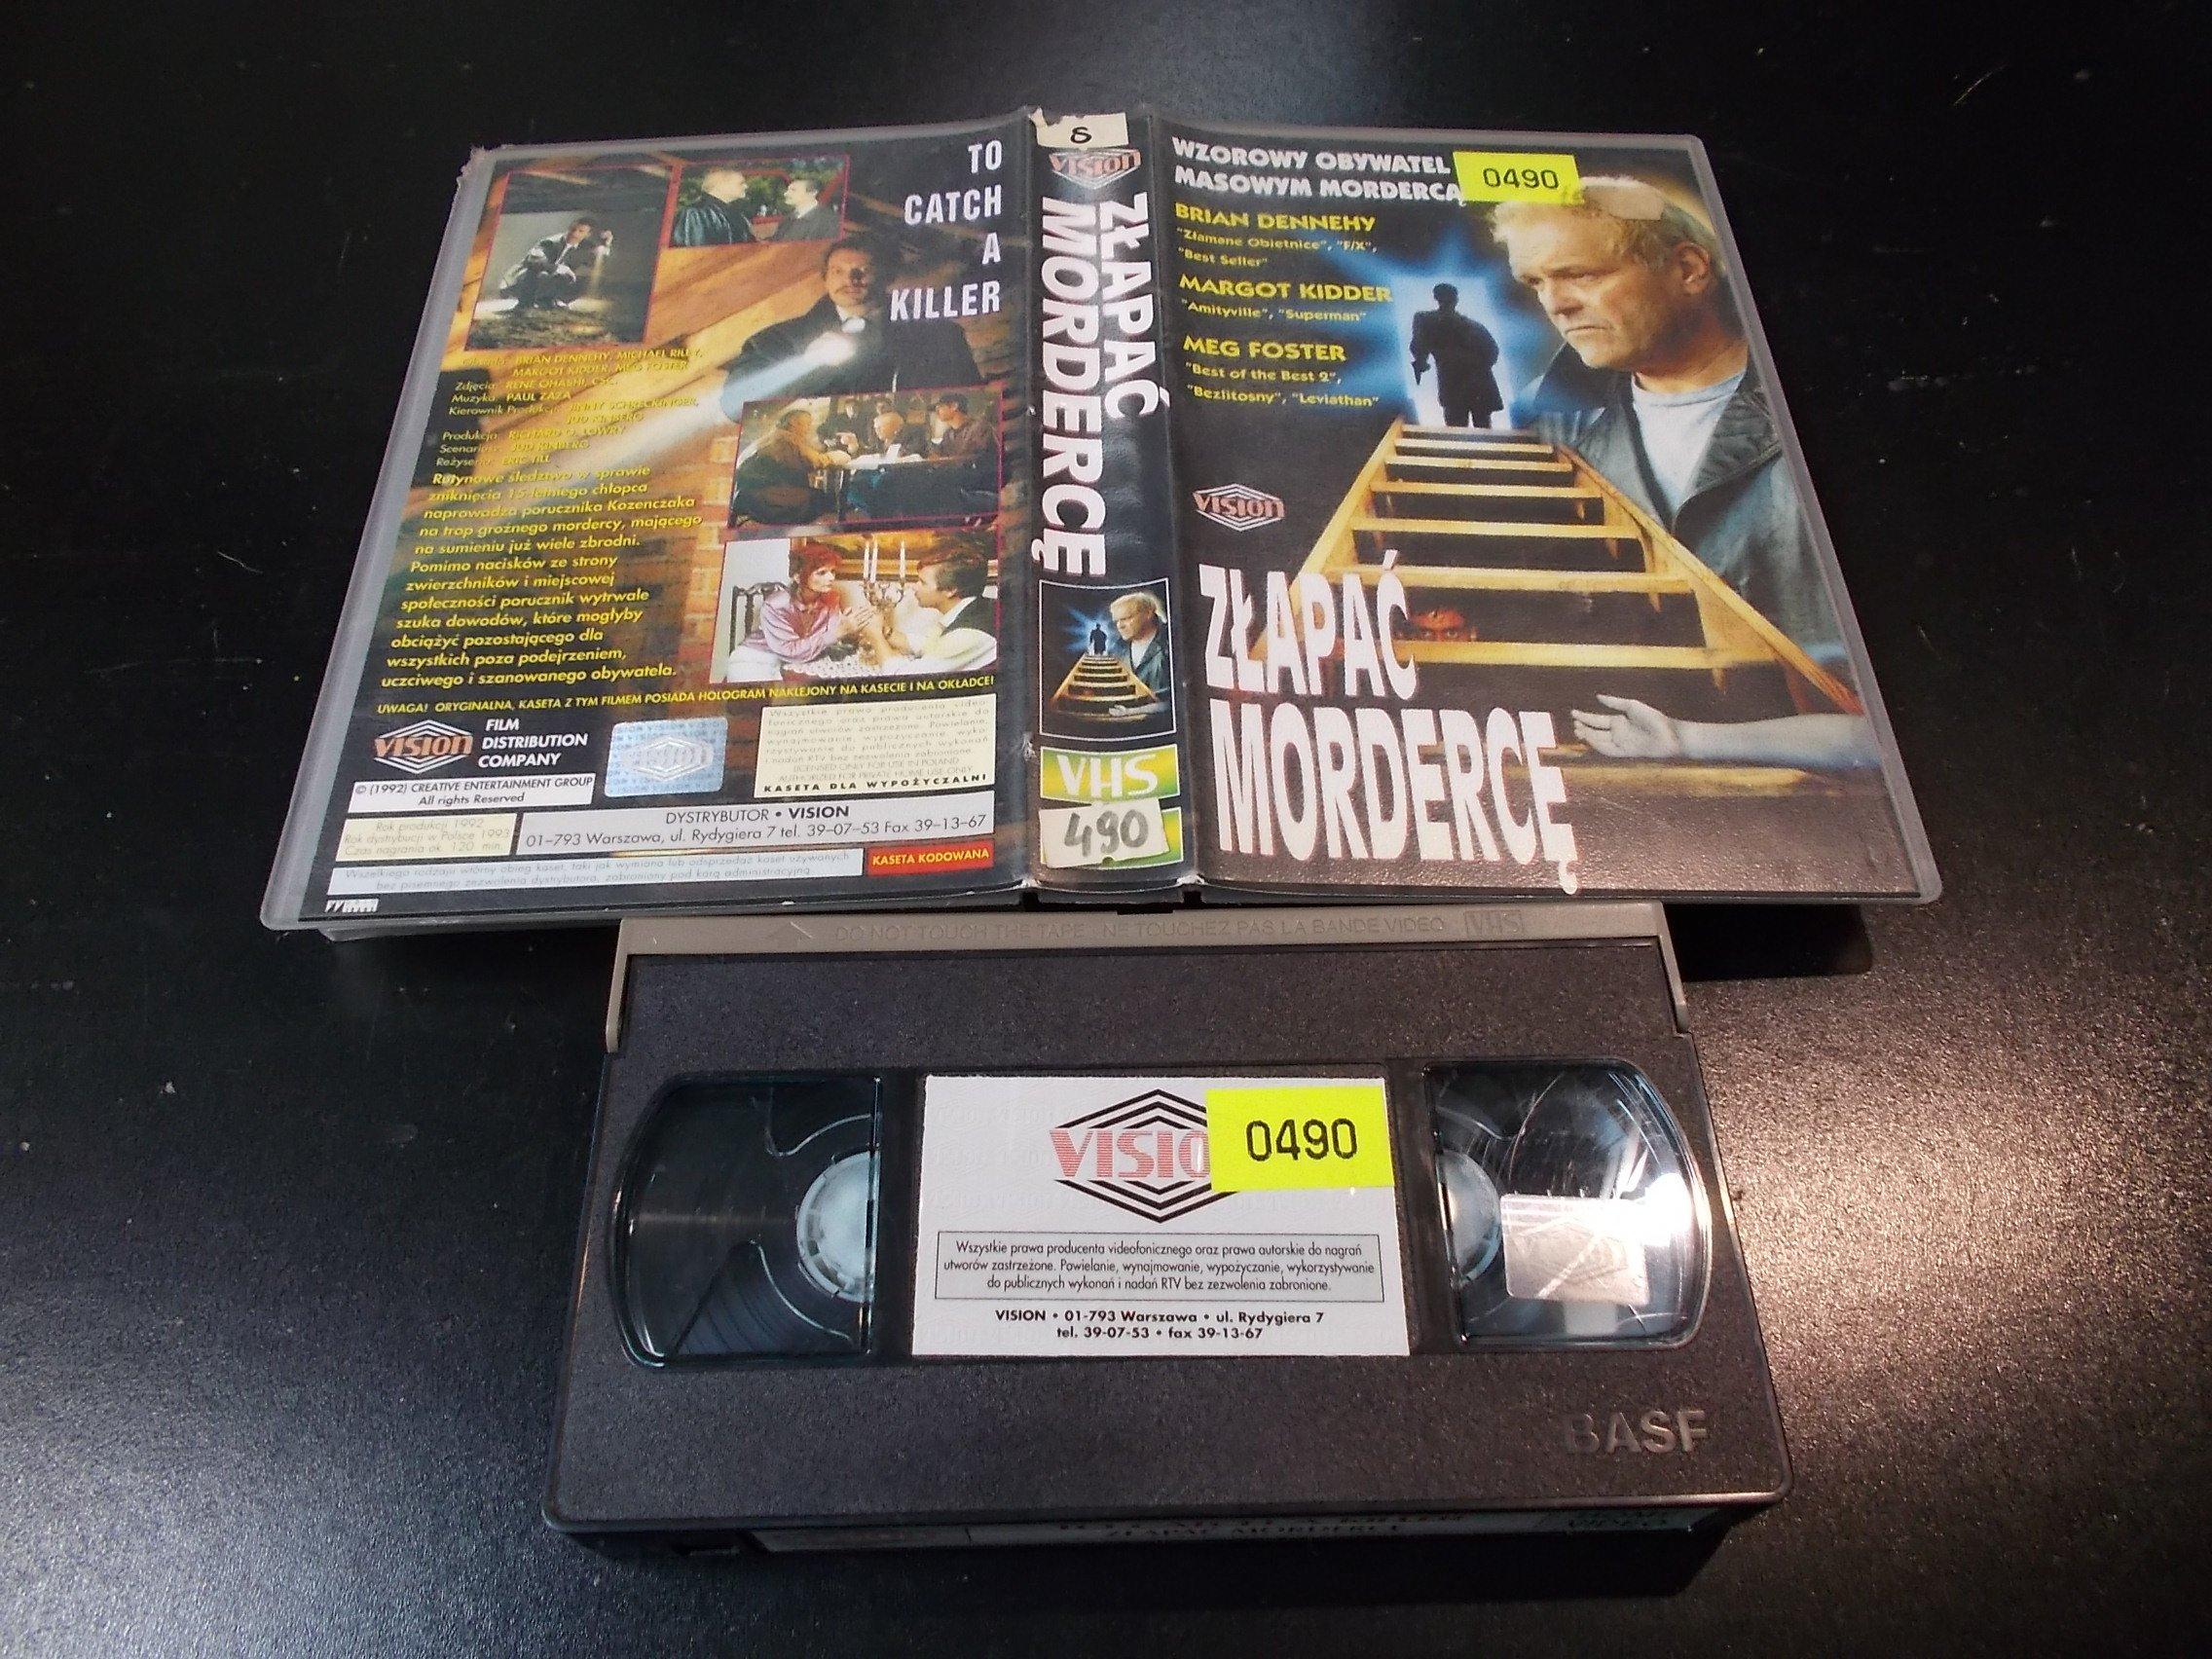 ZŁAPAĆ MORDERCĘ - kaseta Video VHS - 1378 Sklep